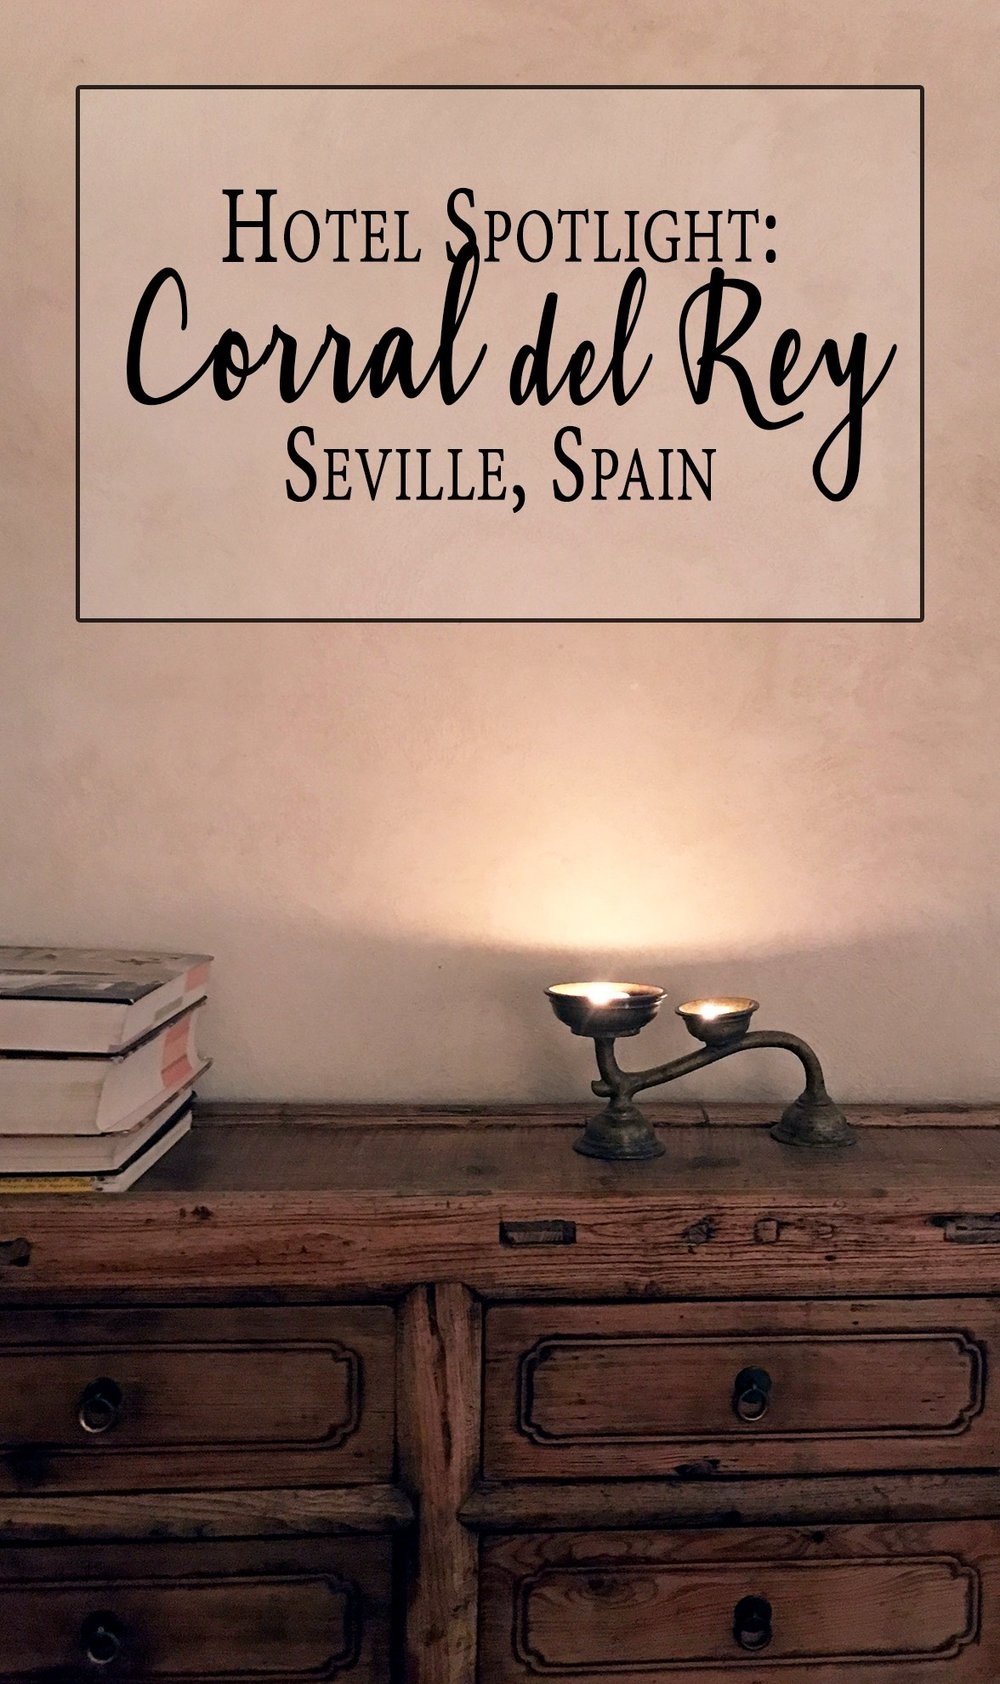 Seville Spain Corral del Rey hotel.jpg